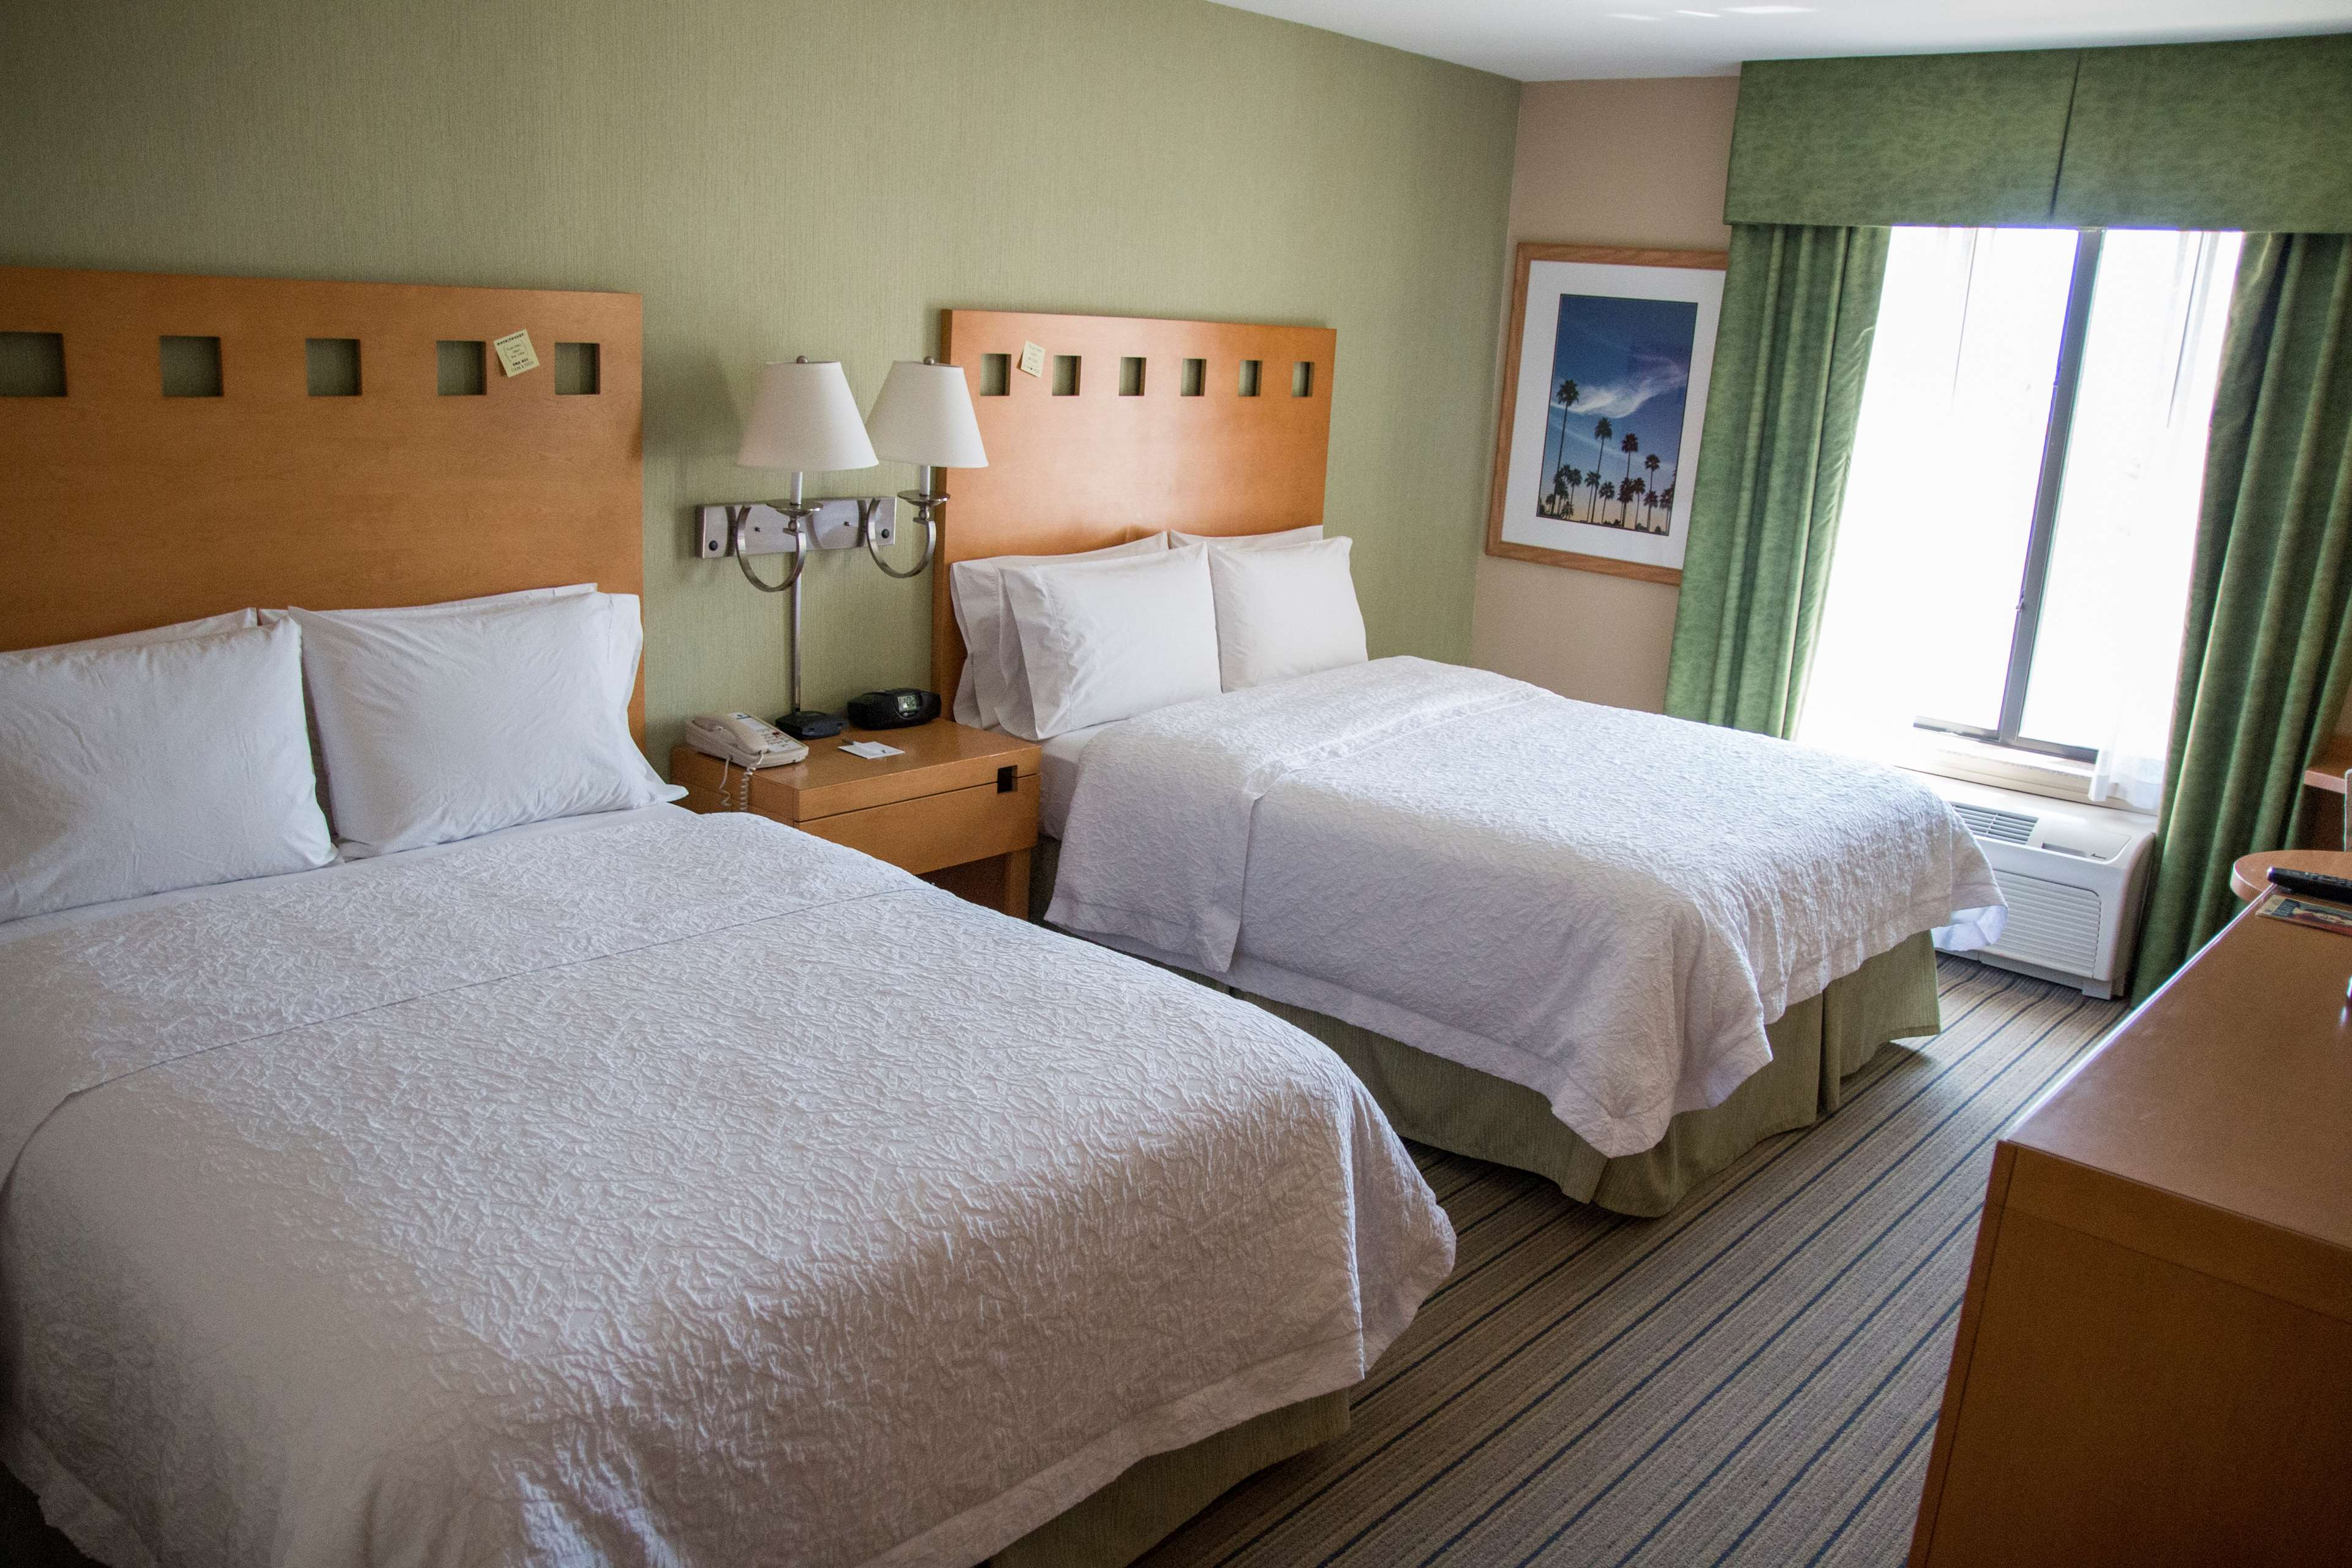 Hampton Inn & Suites Madera image 17